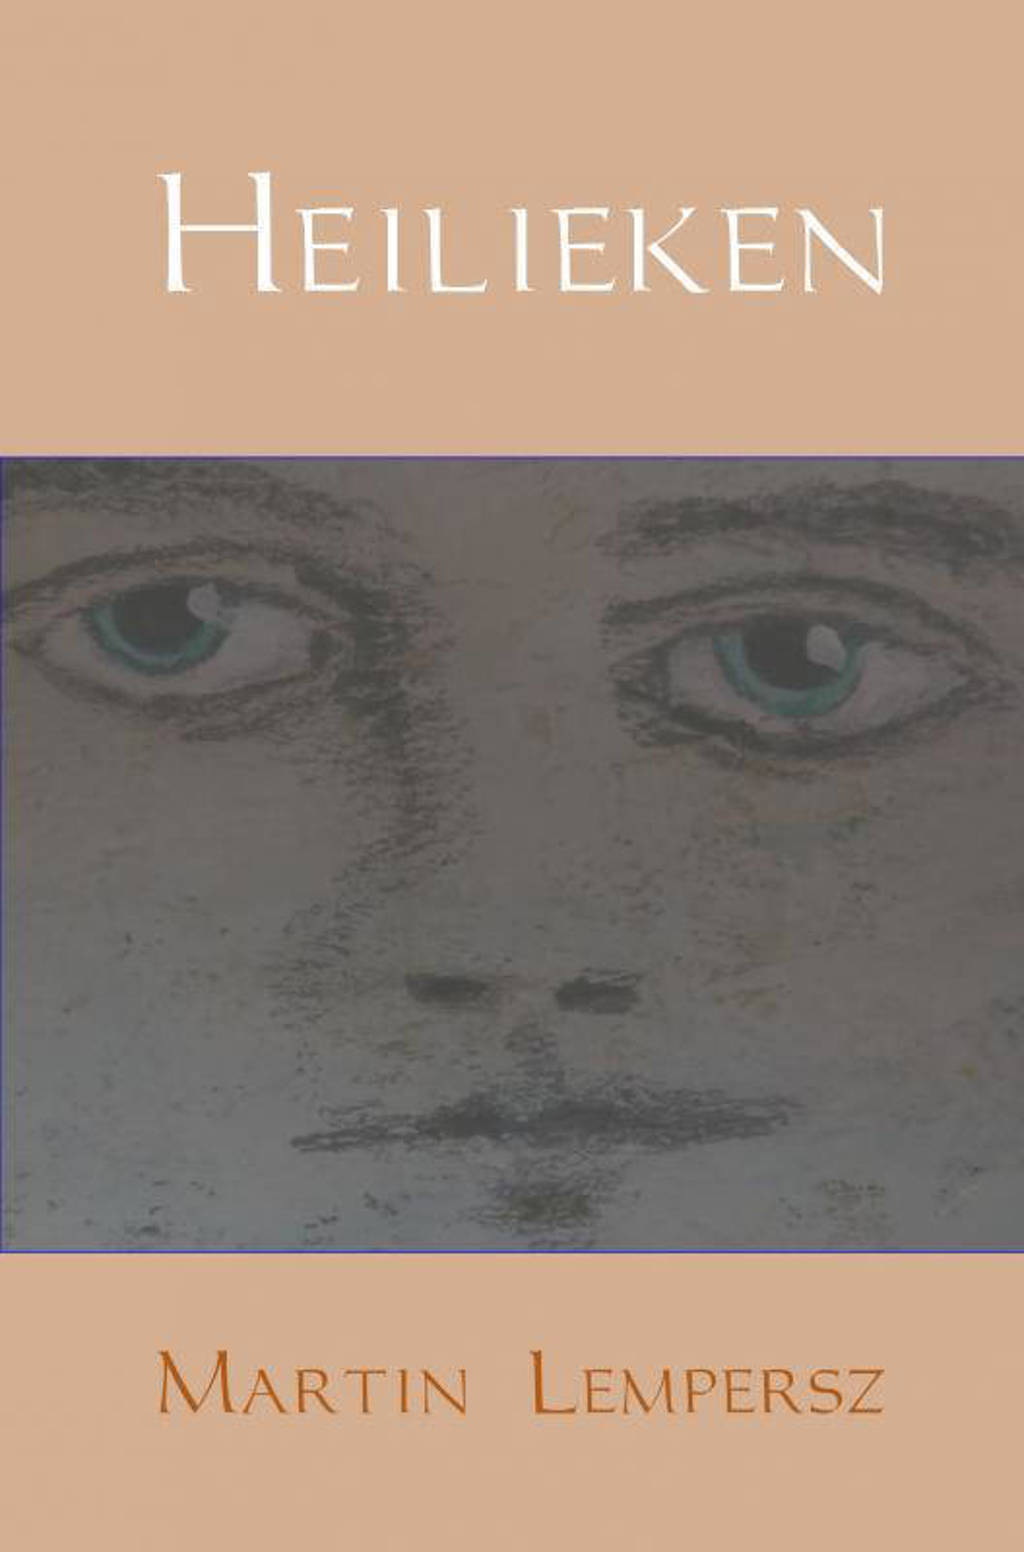 Heilieken - Martin Lempersz